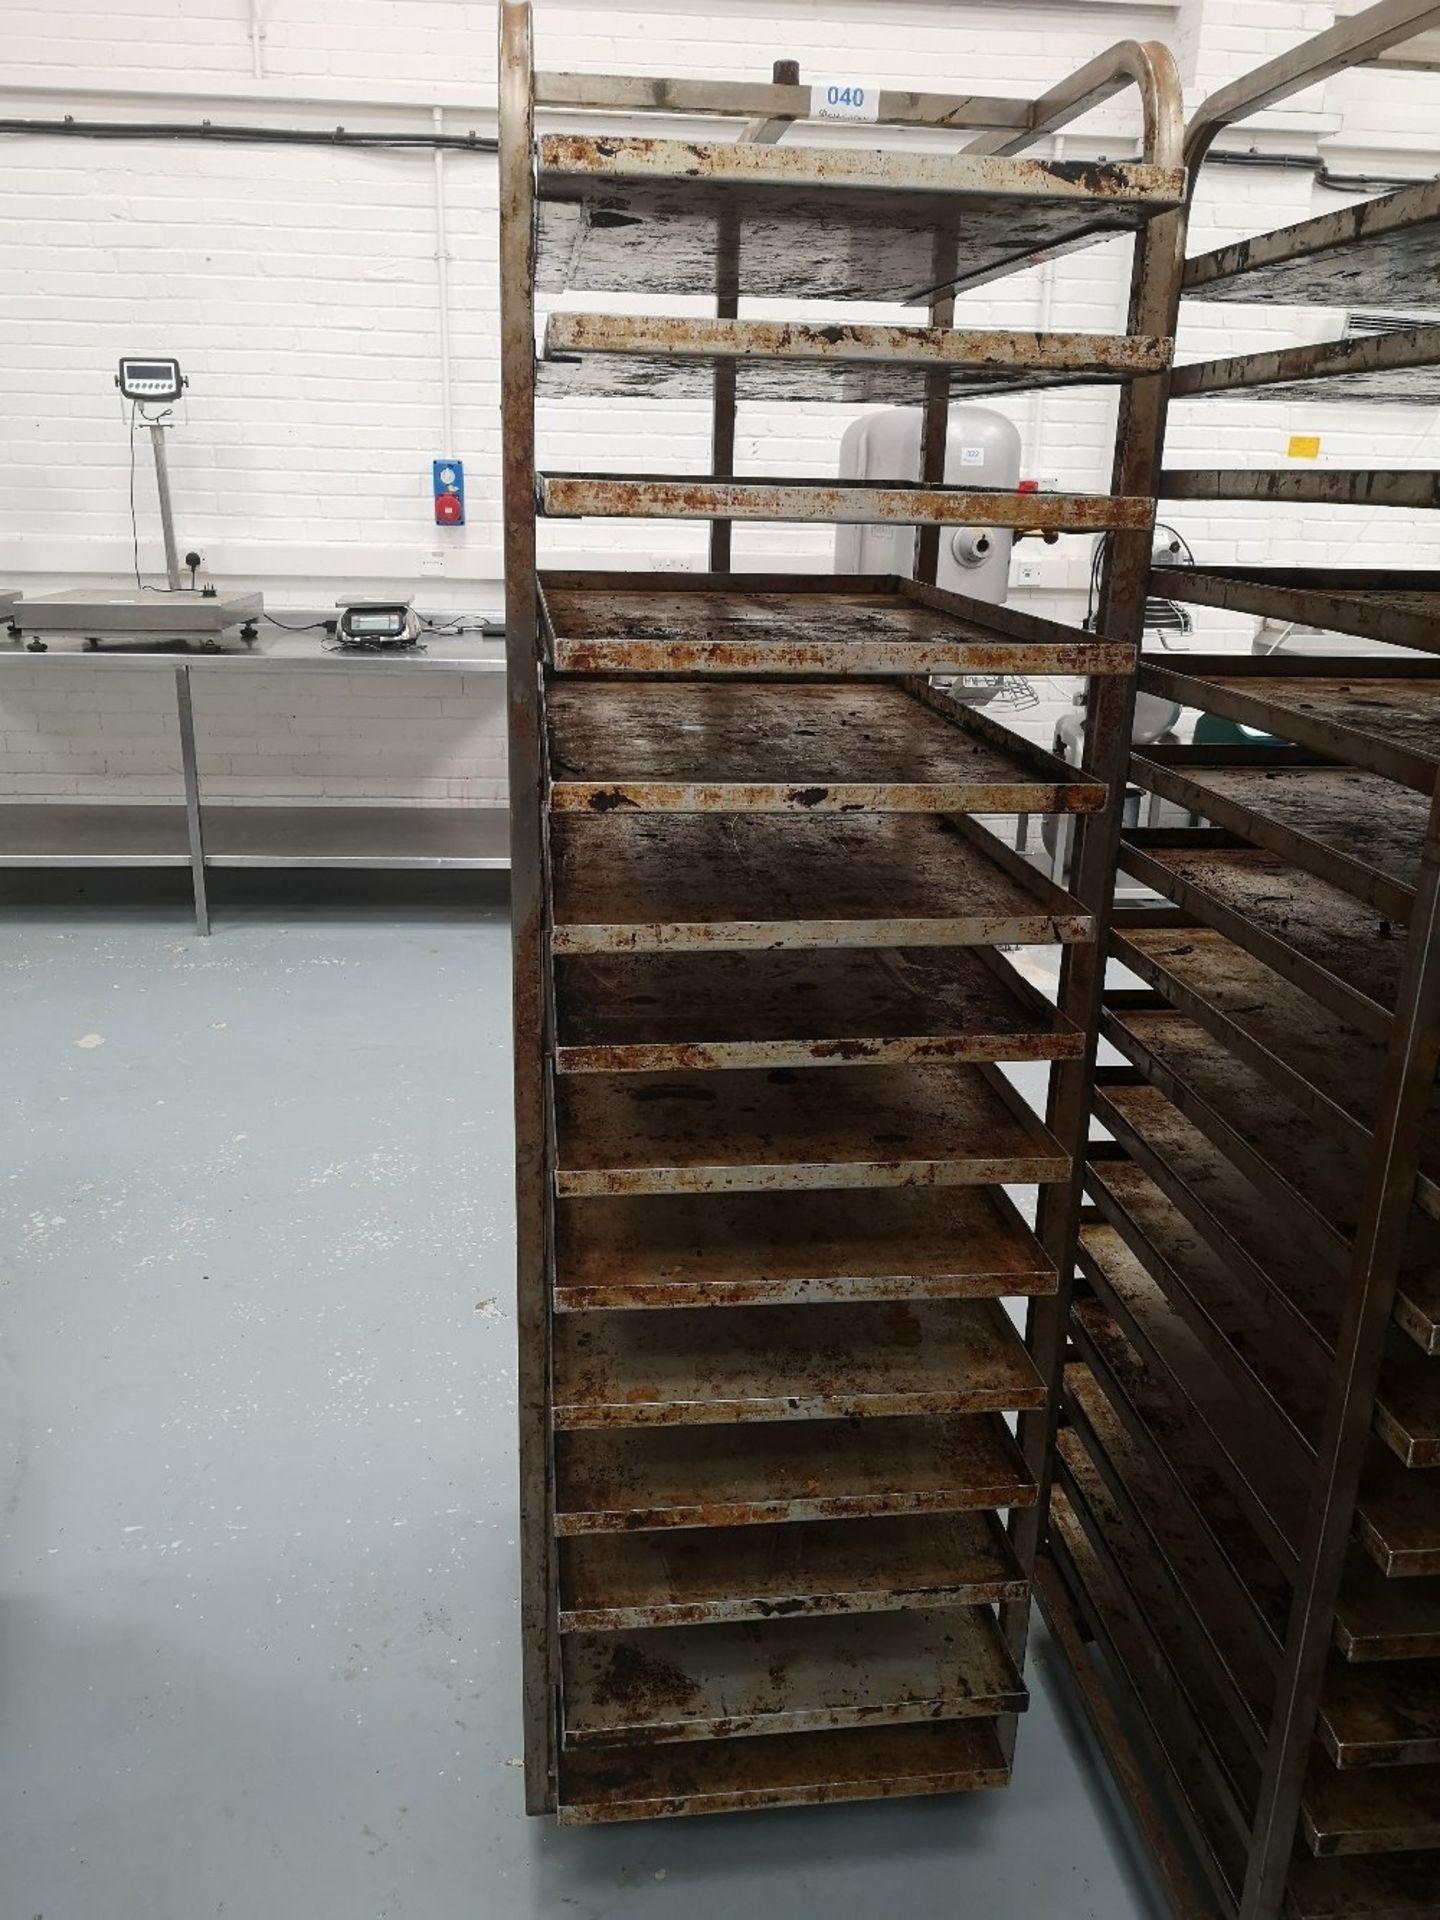 Fourteen Slot Bakery Rack/Tray Trolley - Image 2 of 3